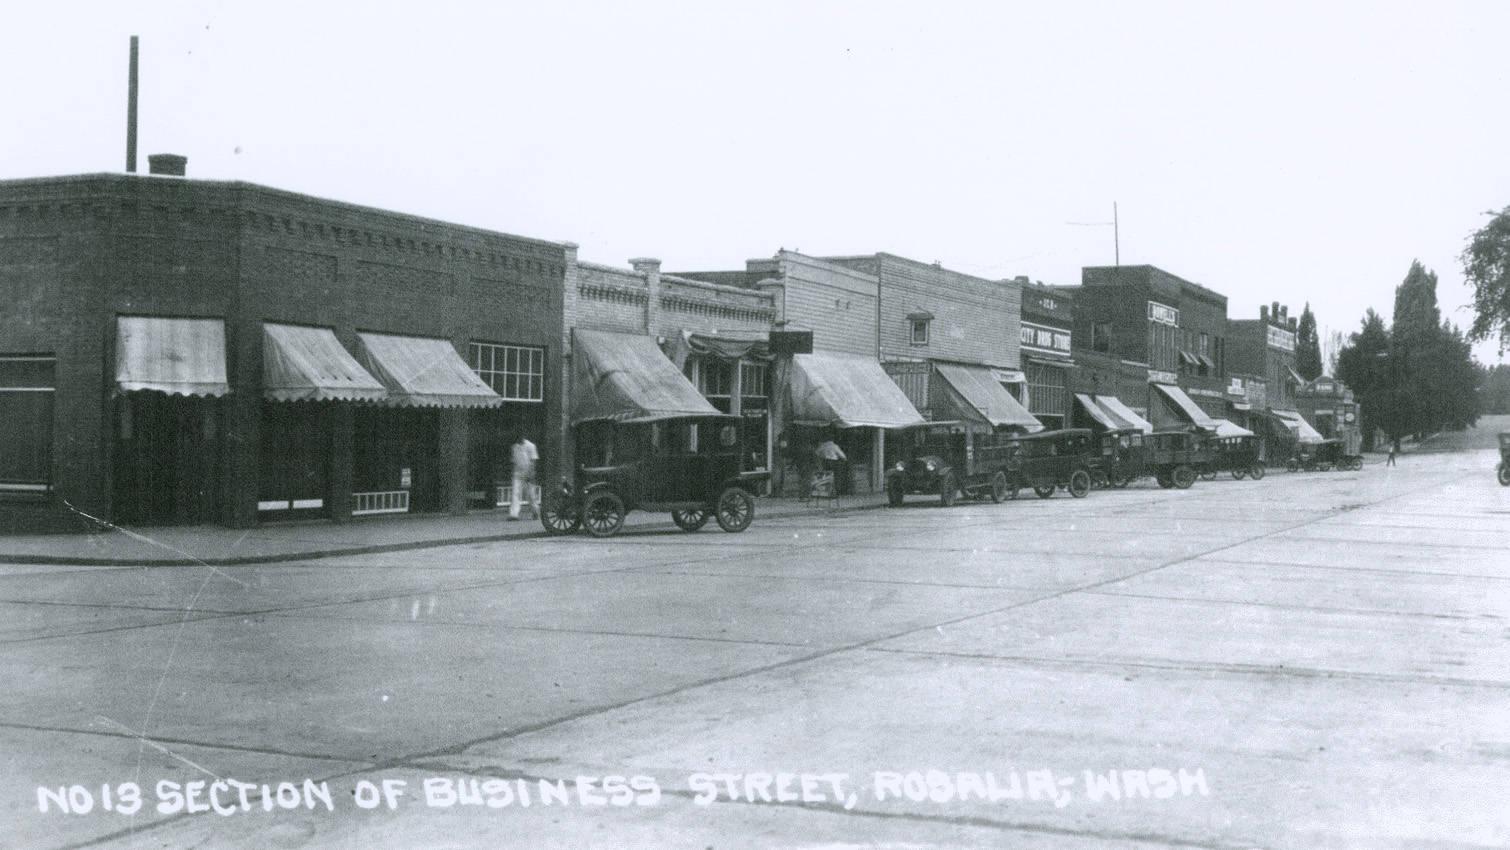 Business_district_in_Rosalia_Washington_circa_19201929